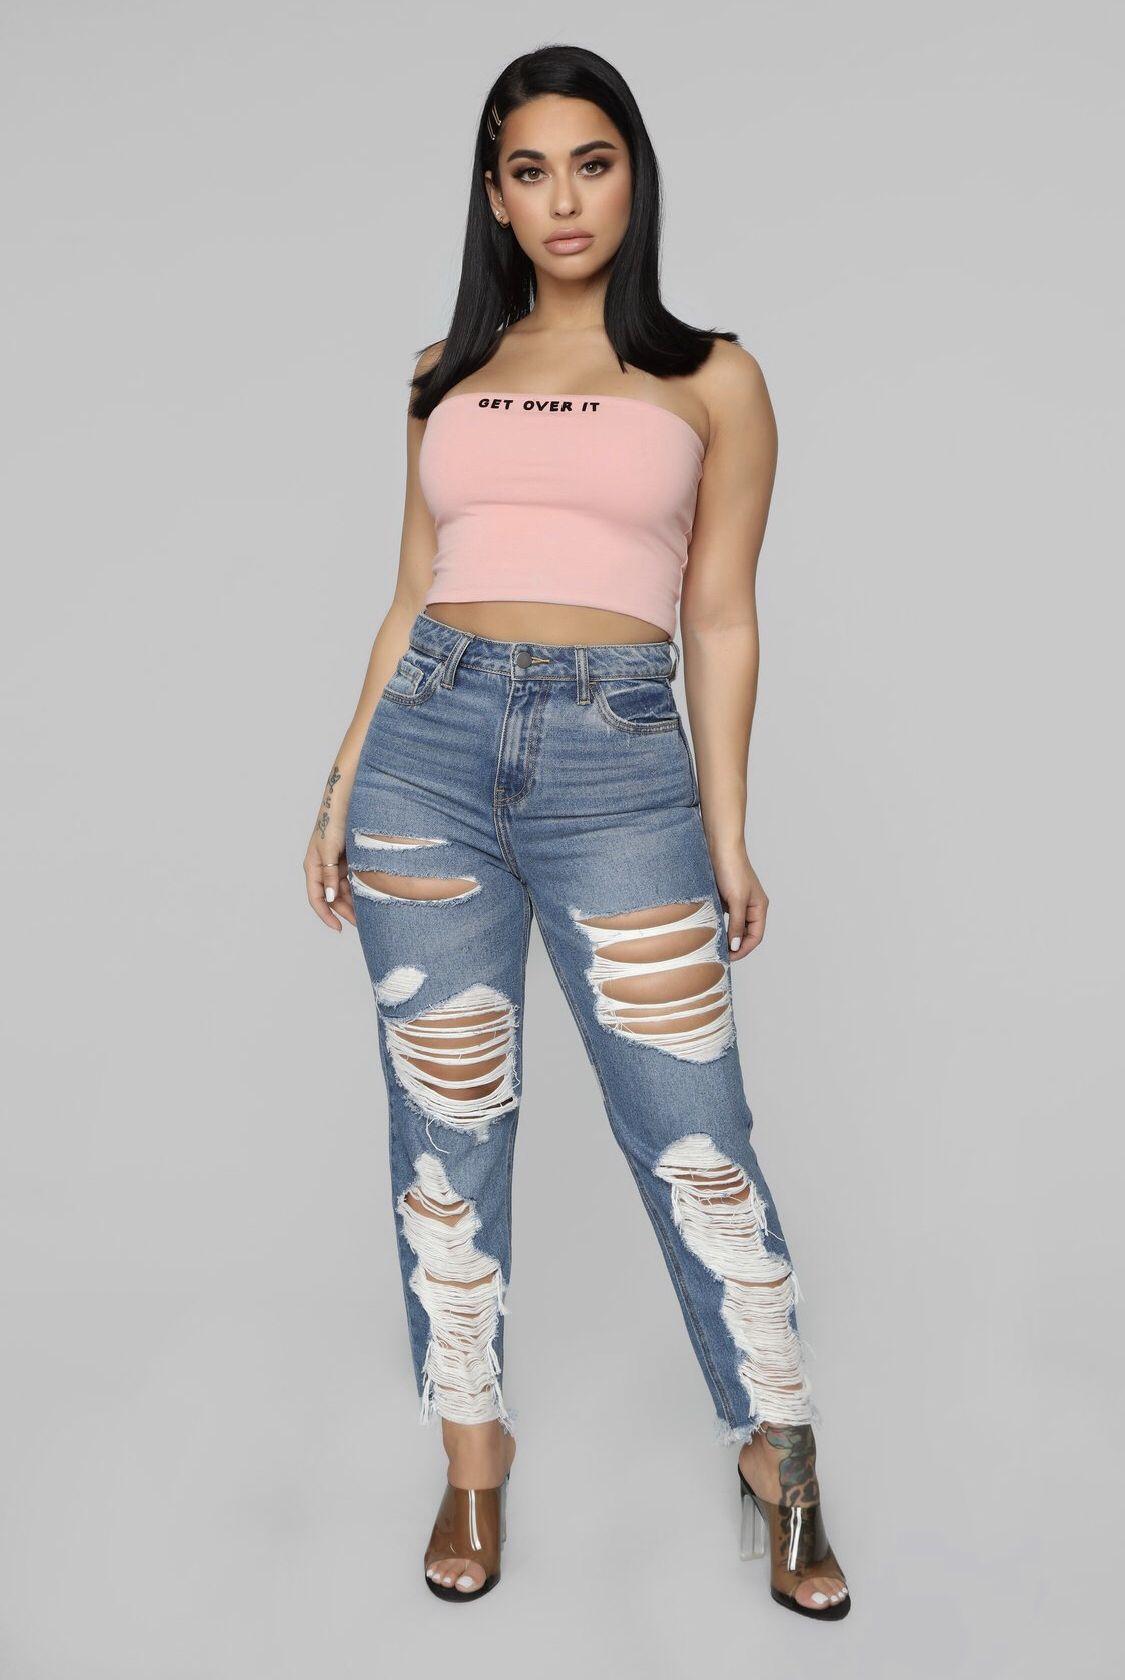 Stephanie Rao In 2020 Fashion Nova Outfits How To Look Classy Fashion